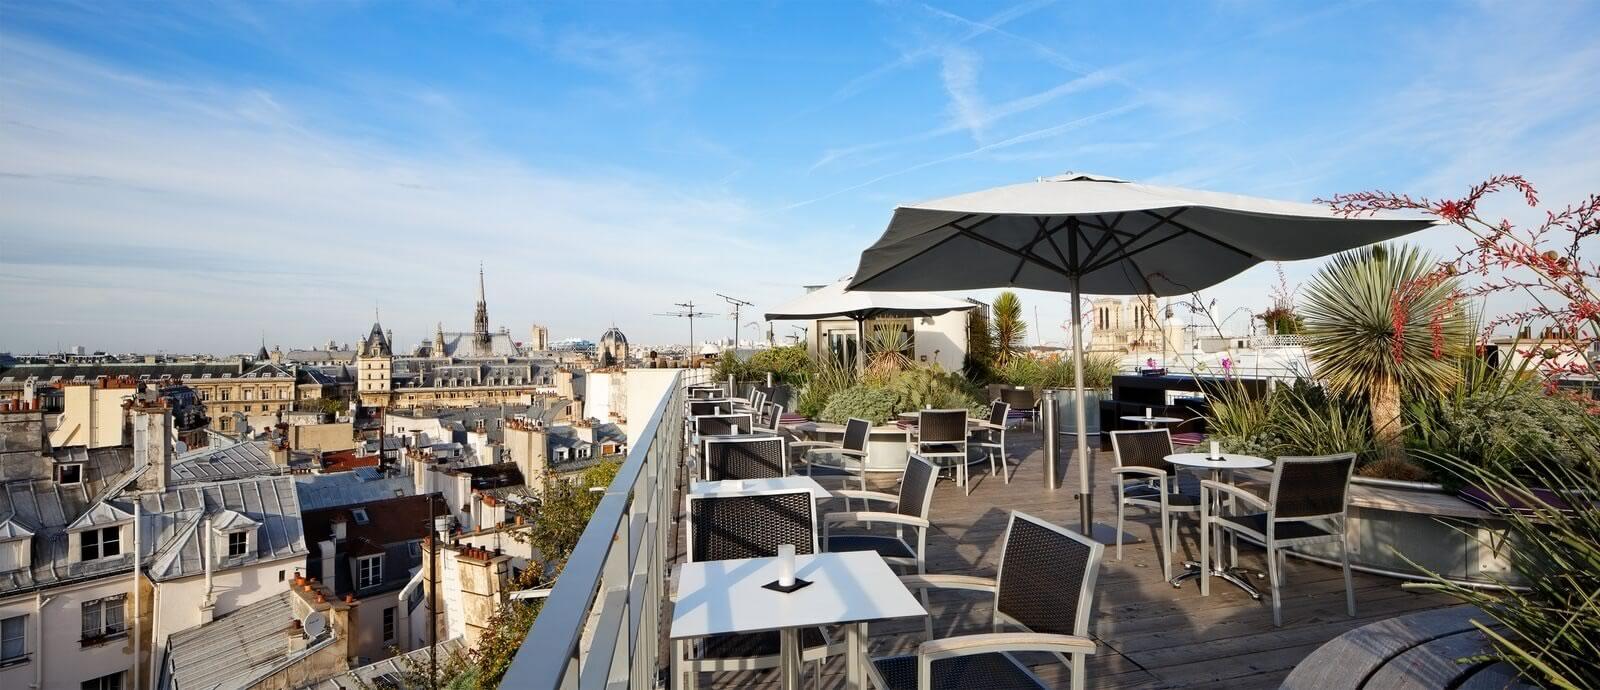 bares-em-paris-rooftop-43